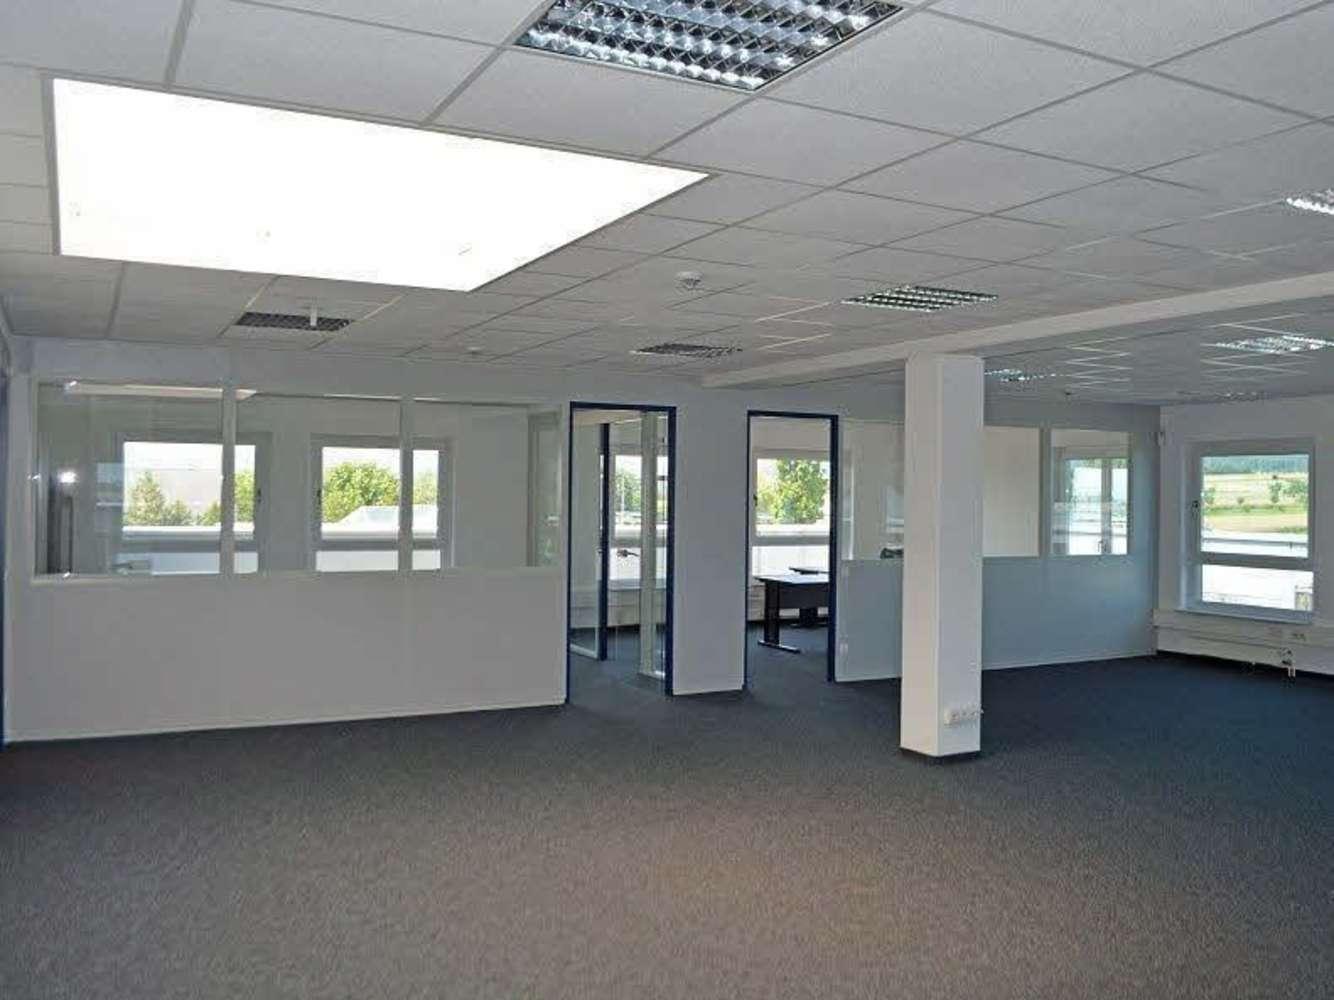 Büros Hofheim am taunus, 65719 - Büro - Hofheim am Taunus, Wallau - F1005 - 9853260